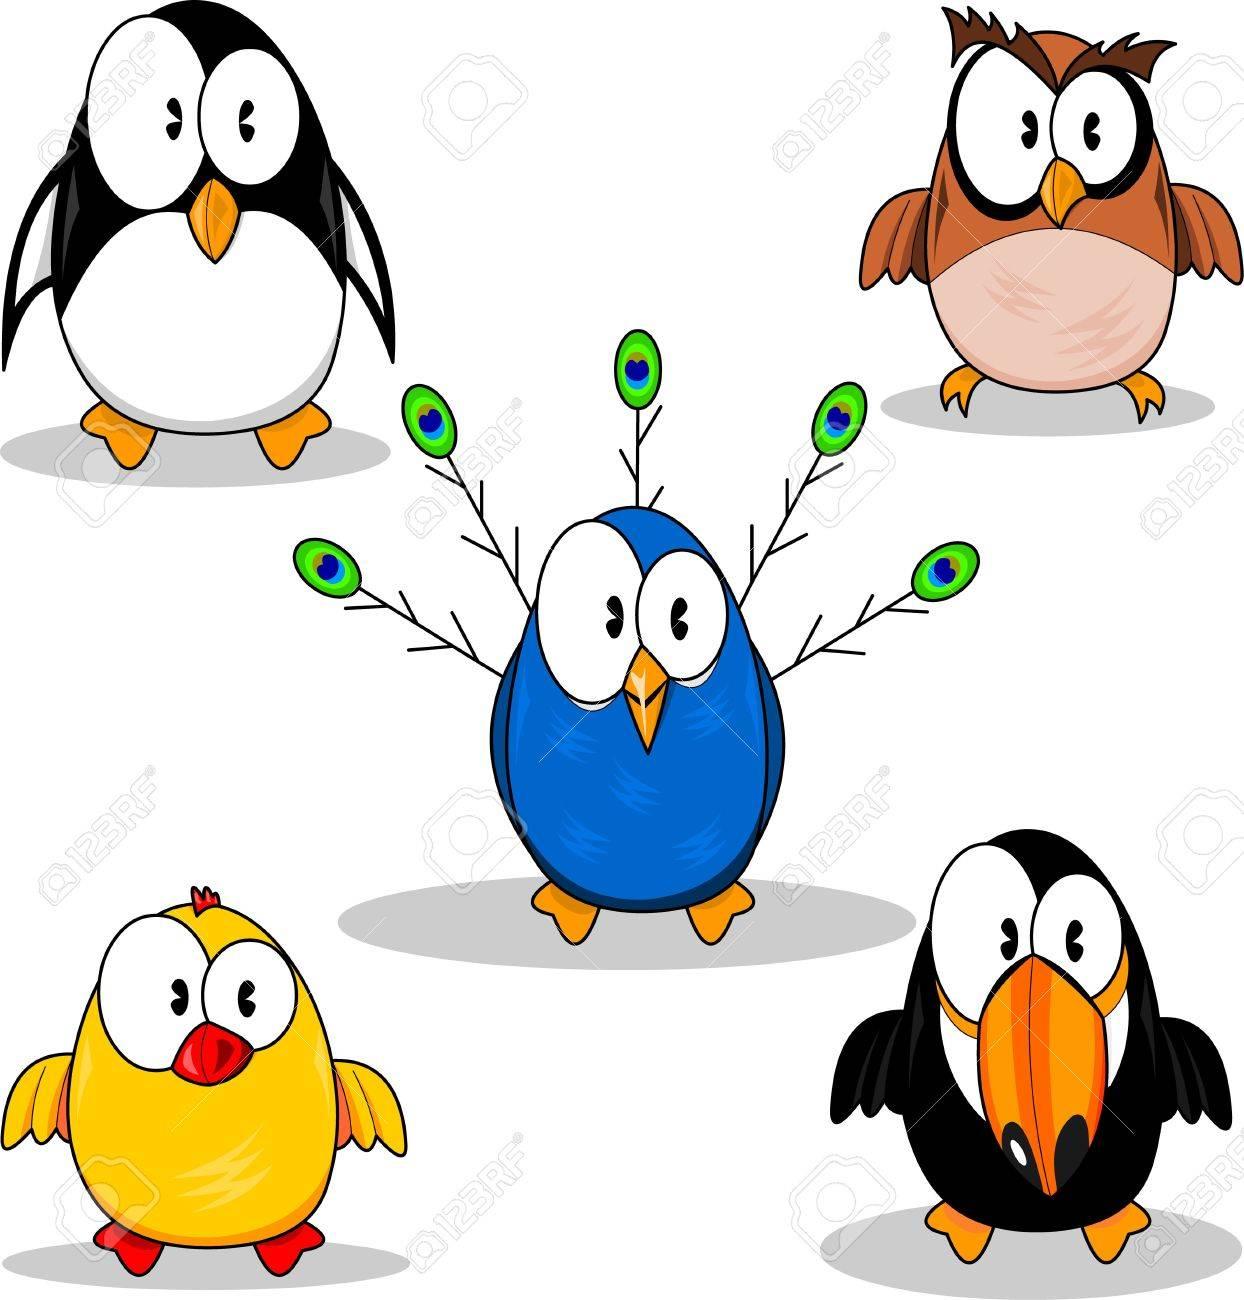 1244x1300 Cartoon Birds Royalty Free Cliparts, Vectors, And Stock